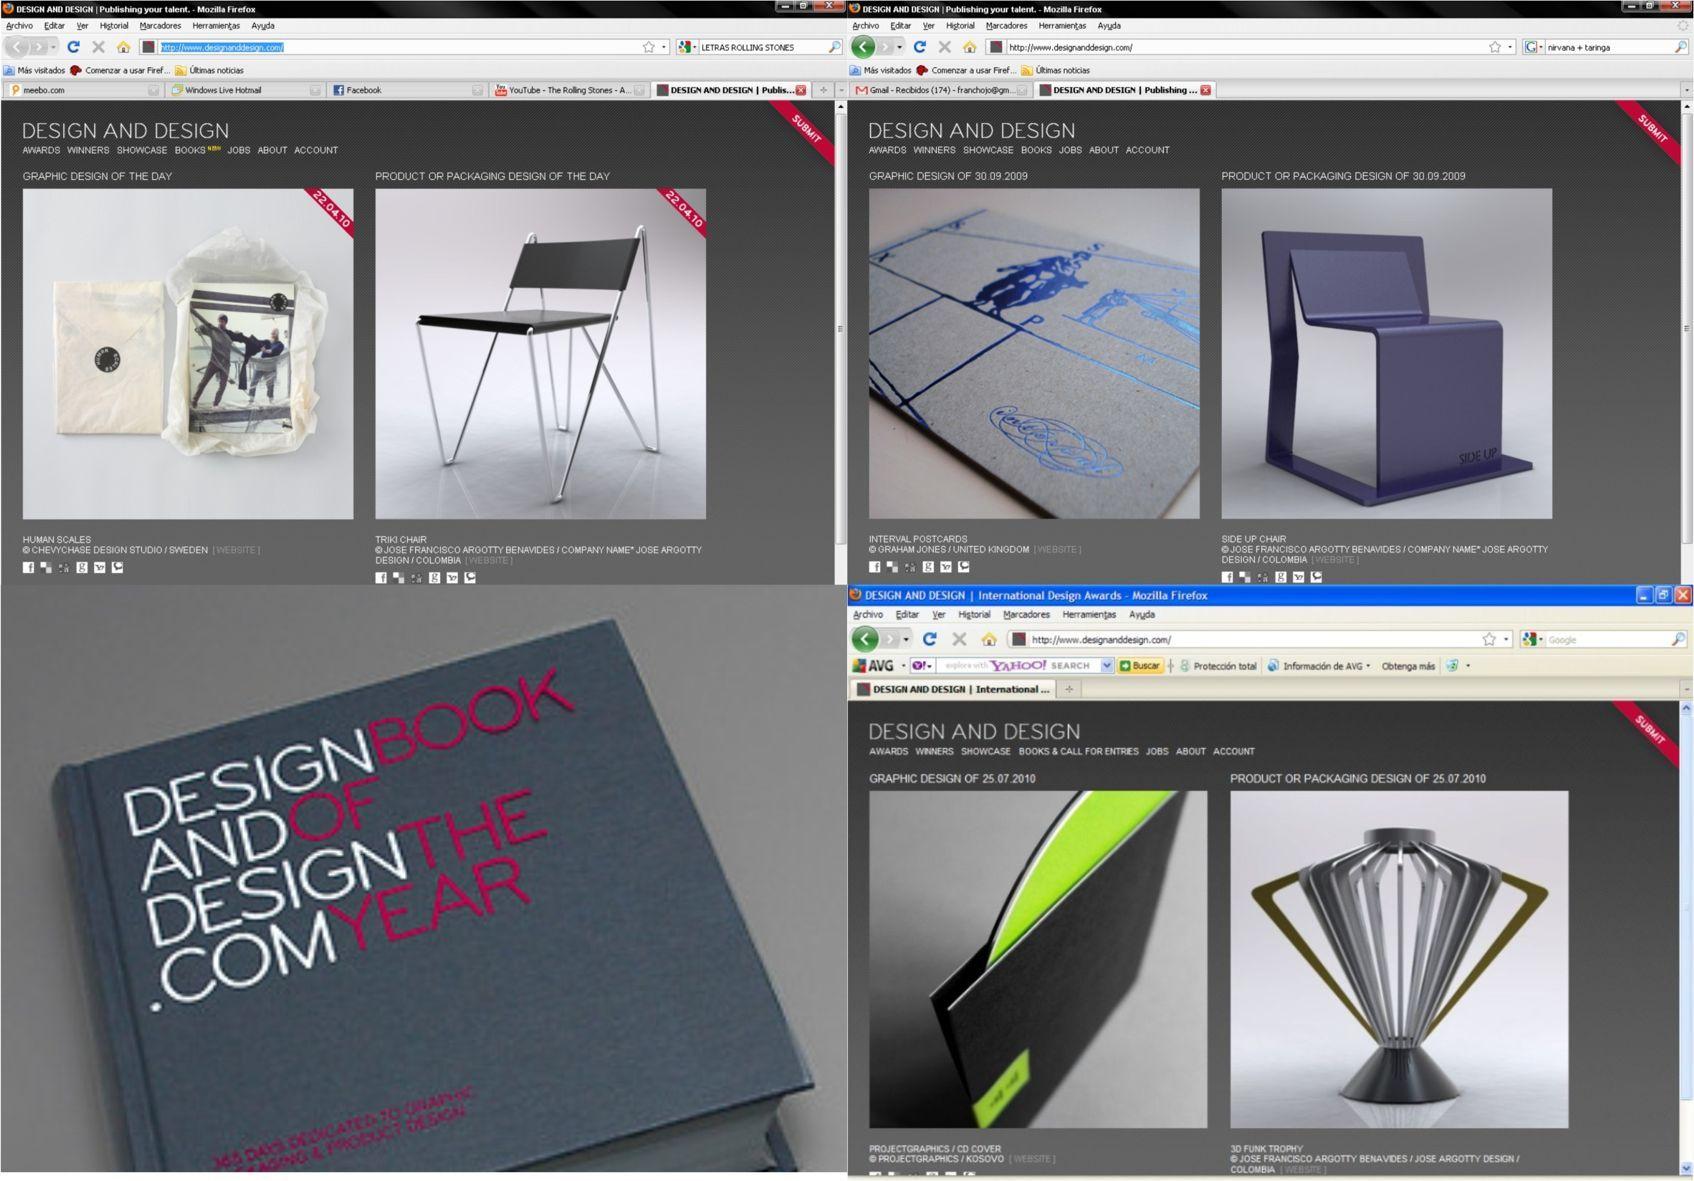 Design and Design Book Francia (1)